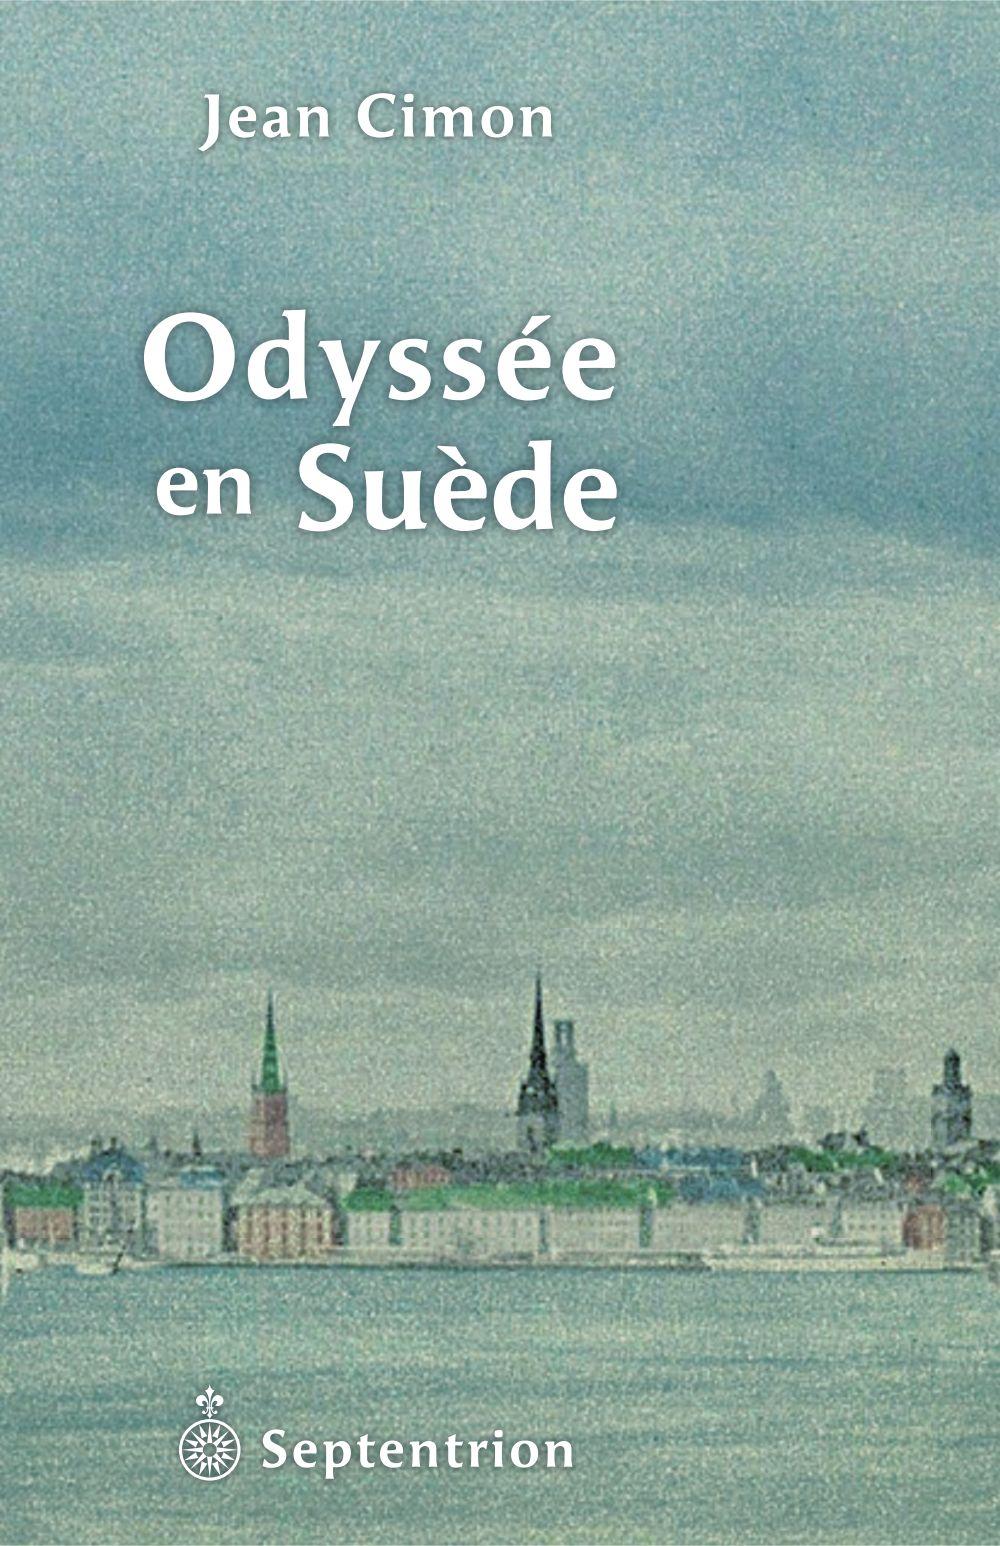 Odyssée en Suède